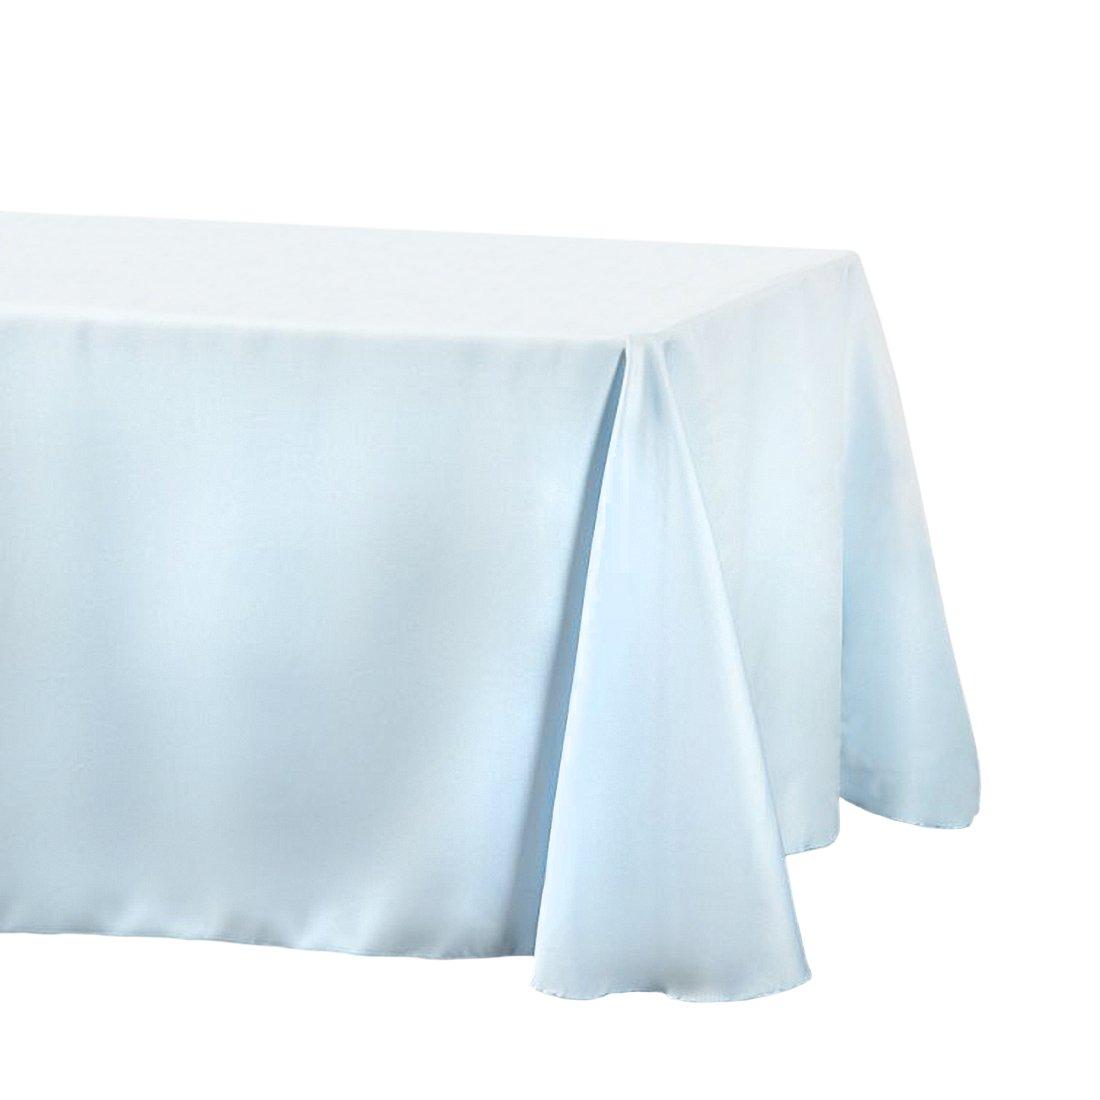 LinenTablecloth Rectangular Tablecloth, 90 x 156, Baby Blue